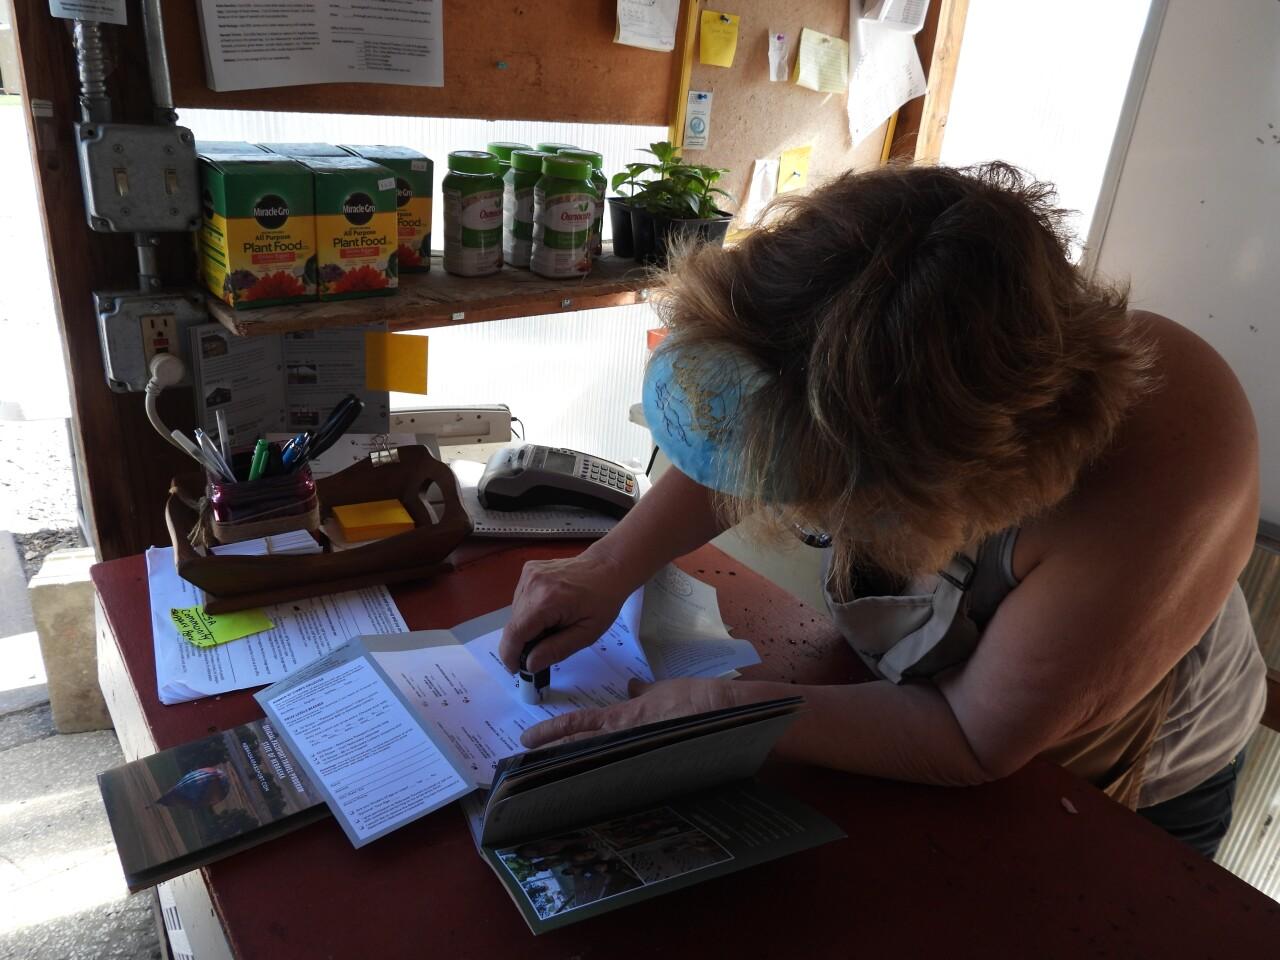 Barb Quinn stamps a passport at Wenninghoff Farm Market